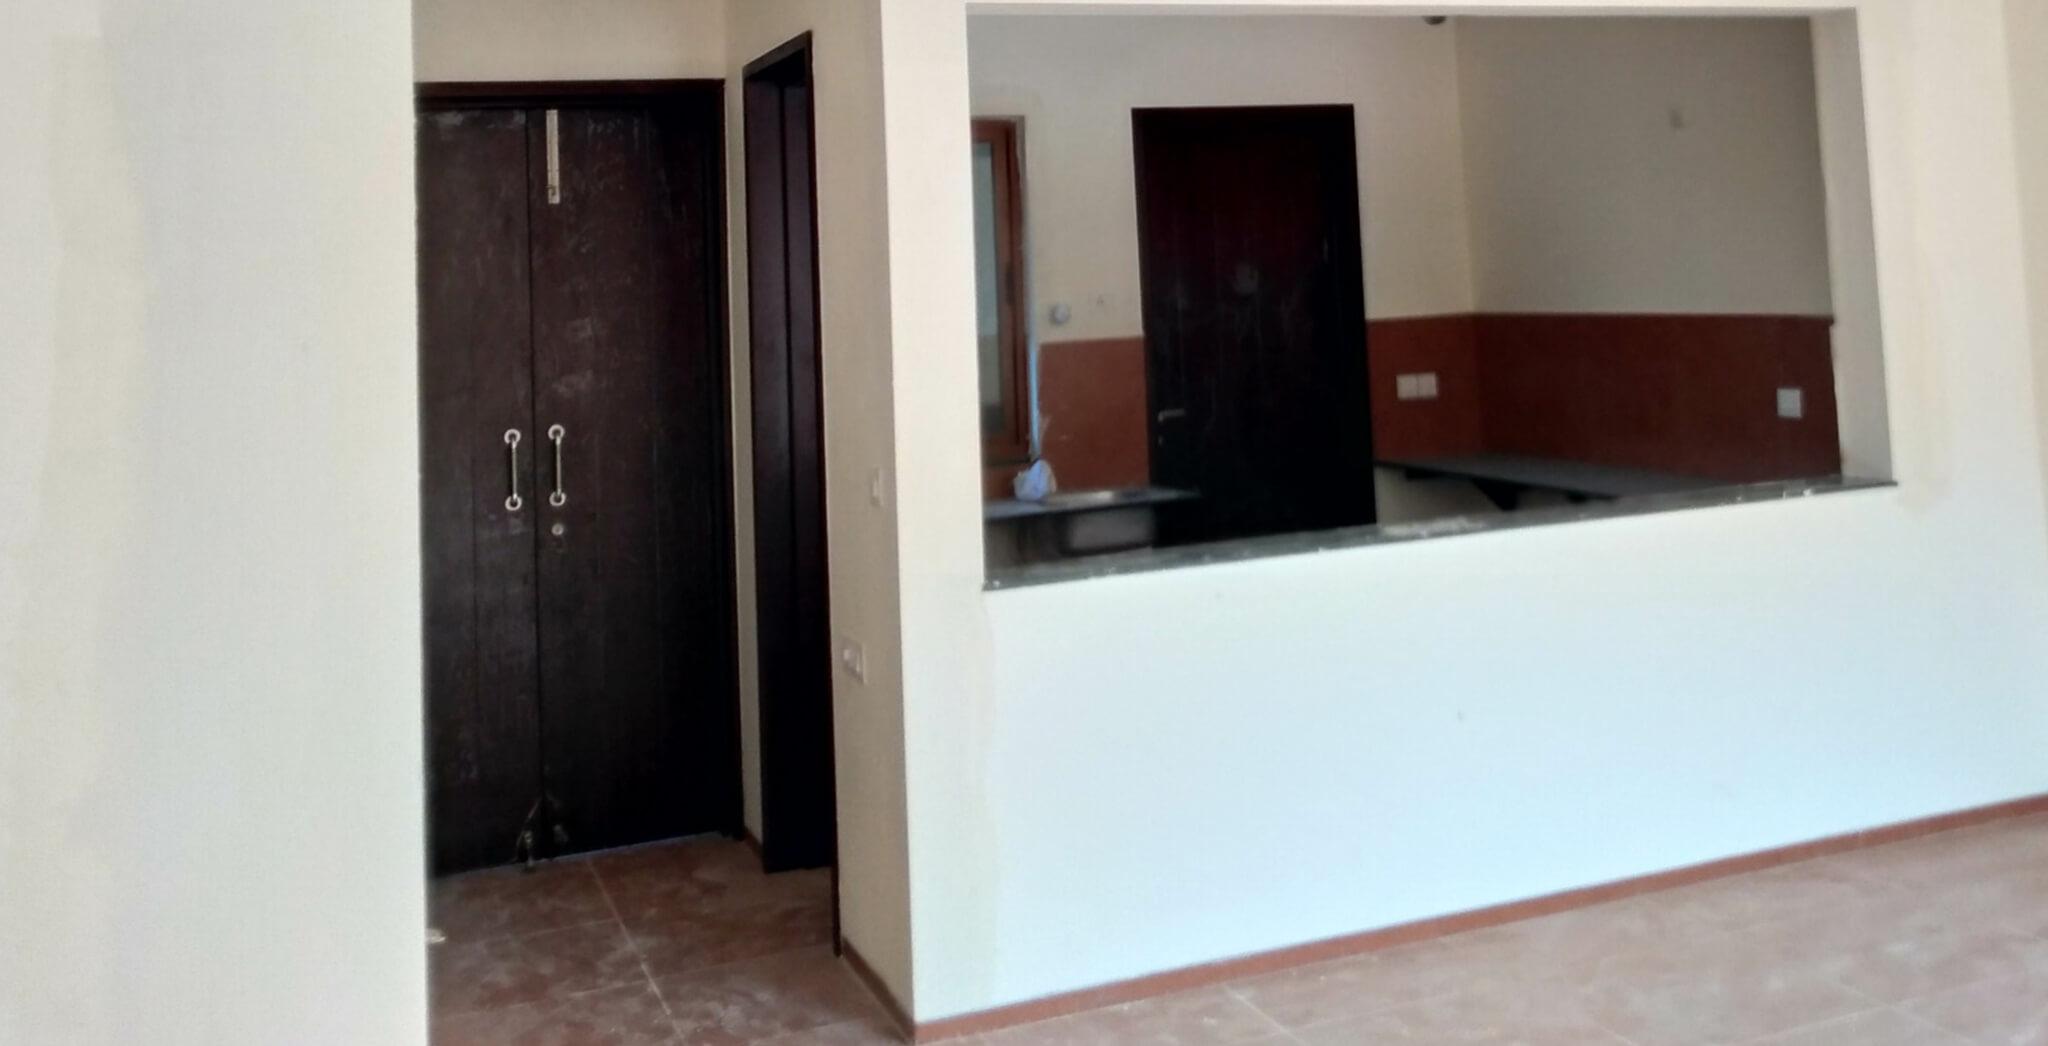 Nov 2018 - Villa B-05A internal final coat painting work-in-progress